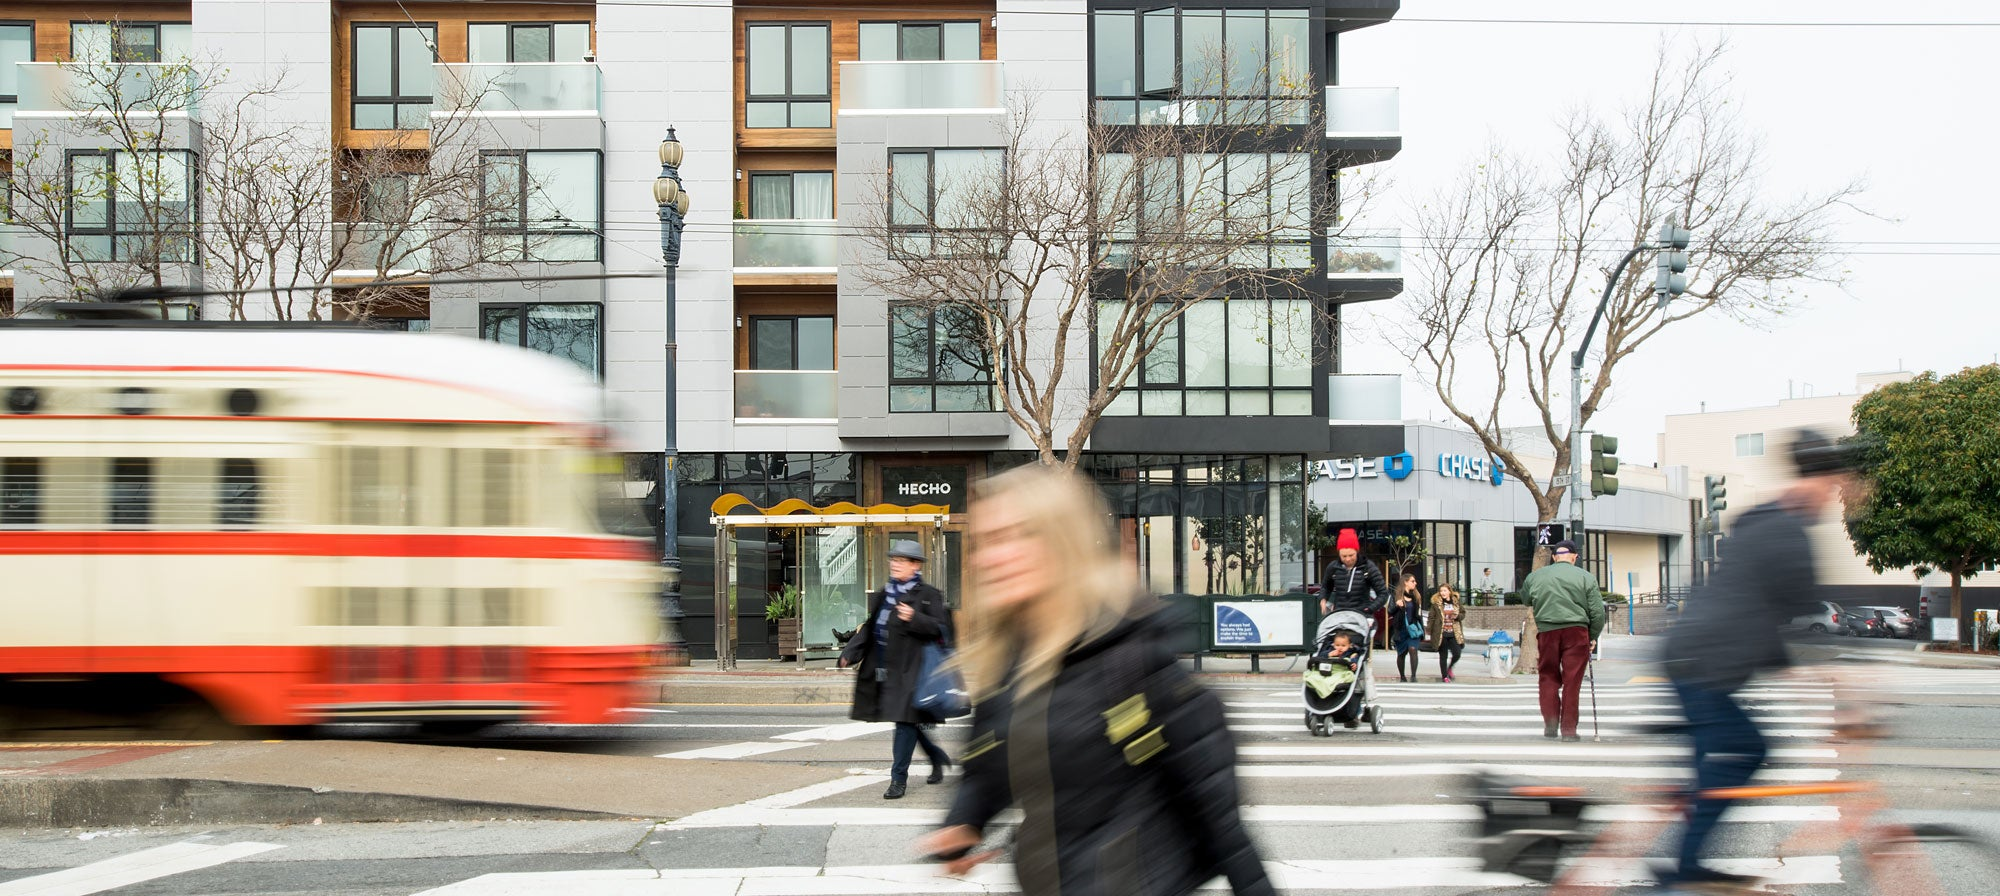 Pedestrians and transit near housing